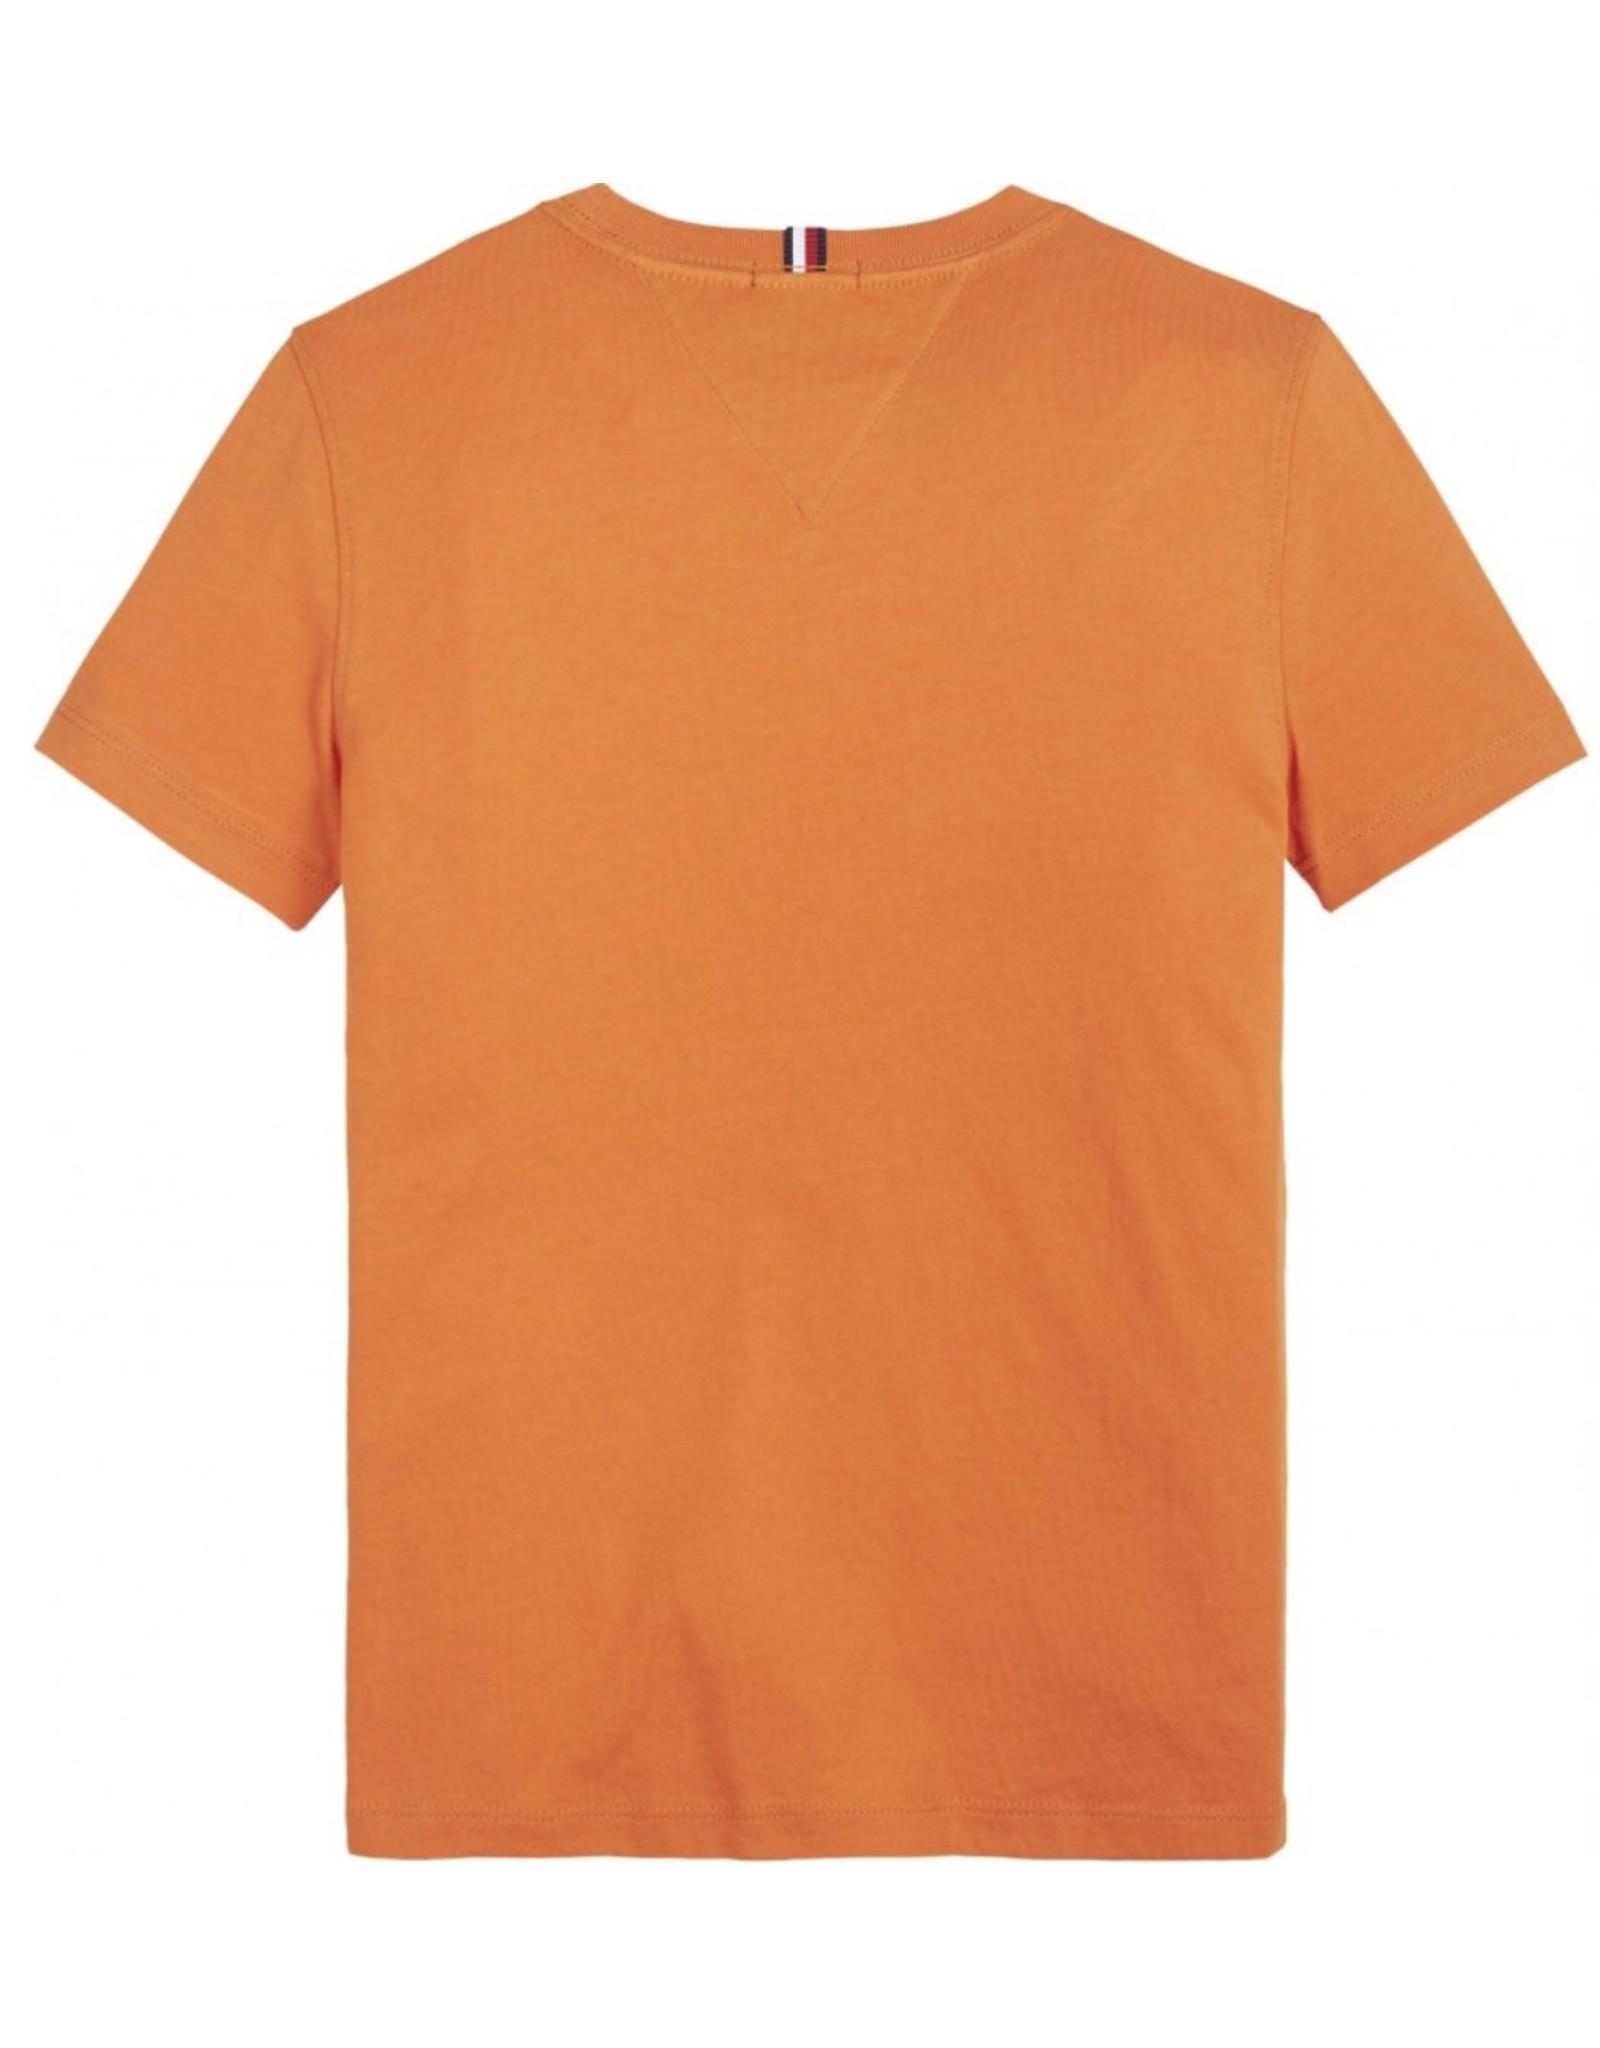 Tommy Hilfiger 6114 T-shirt